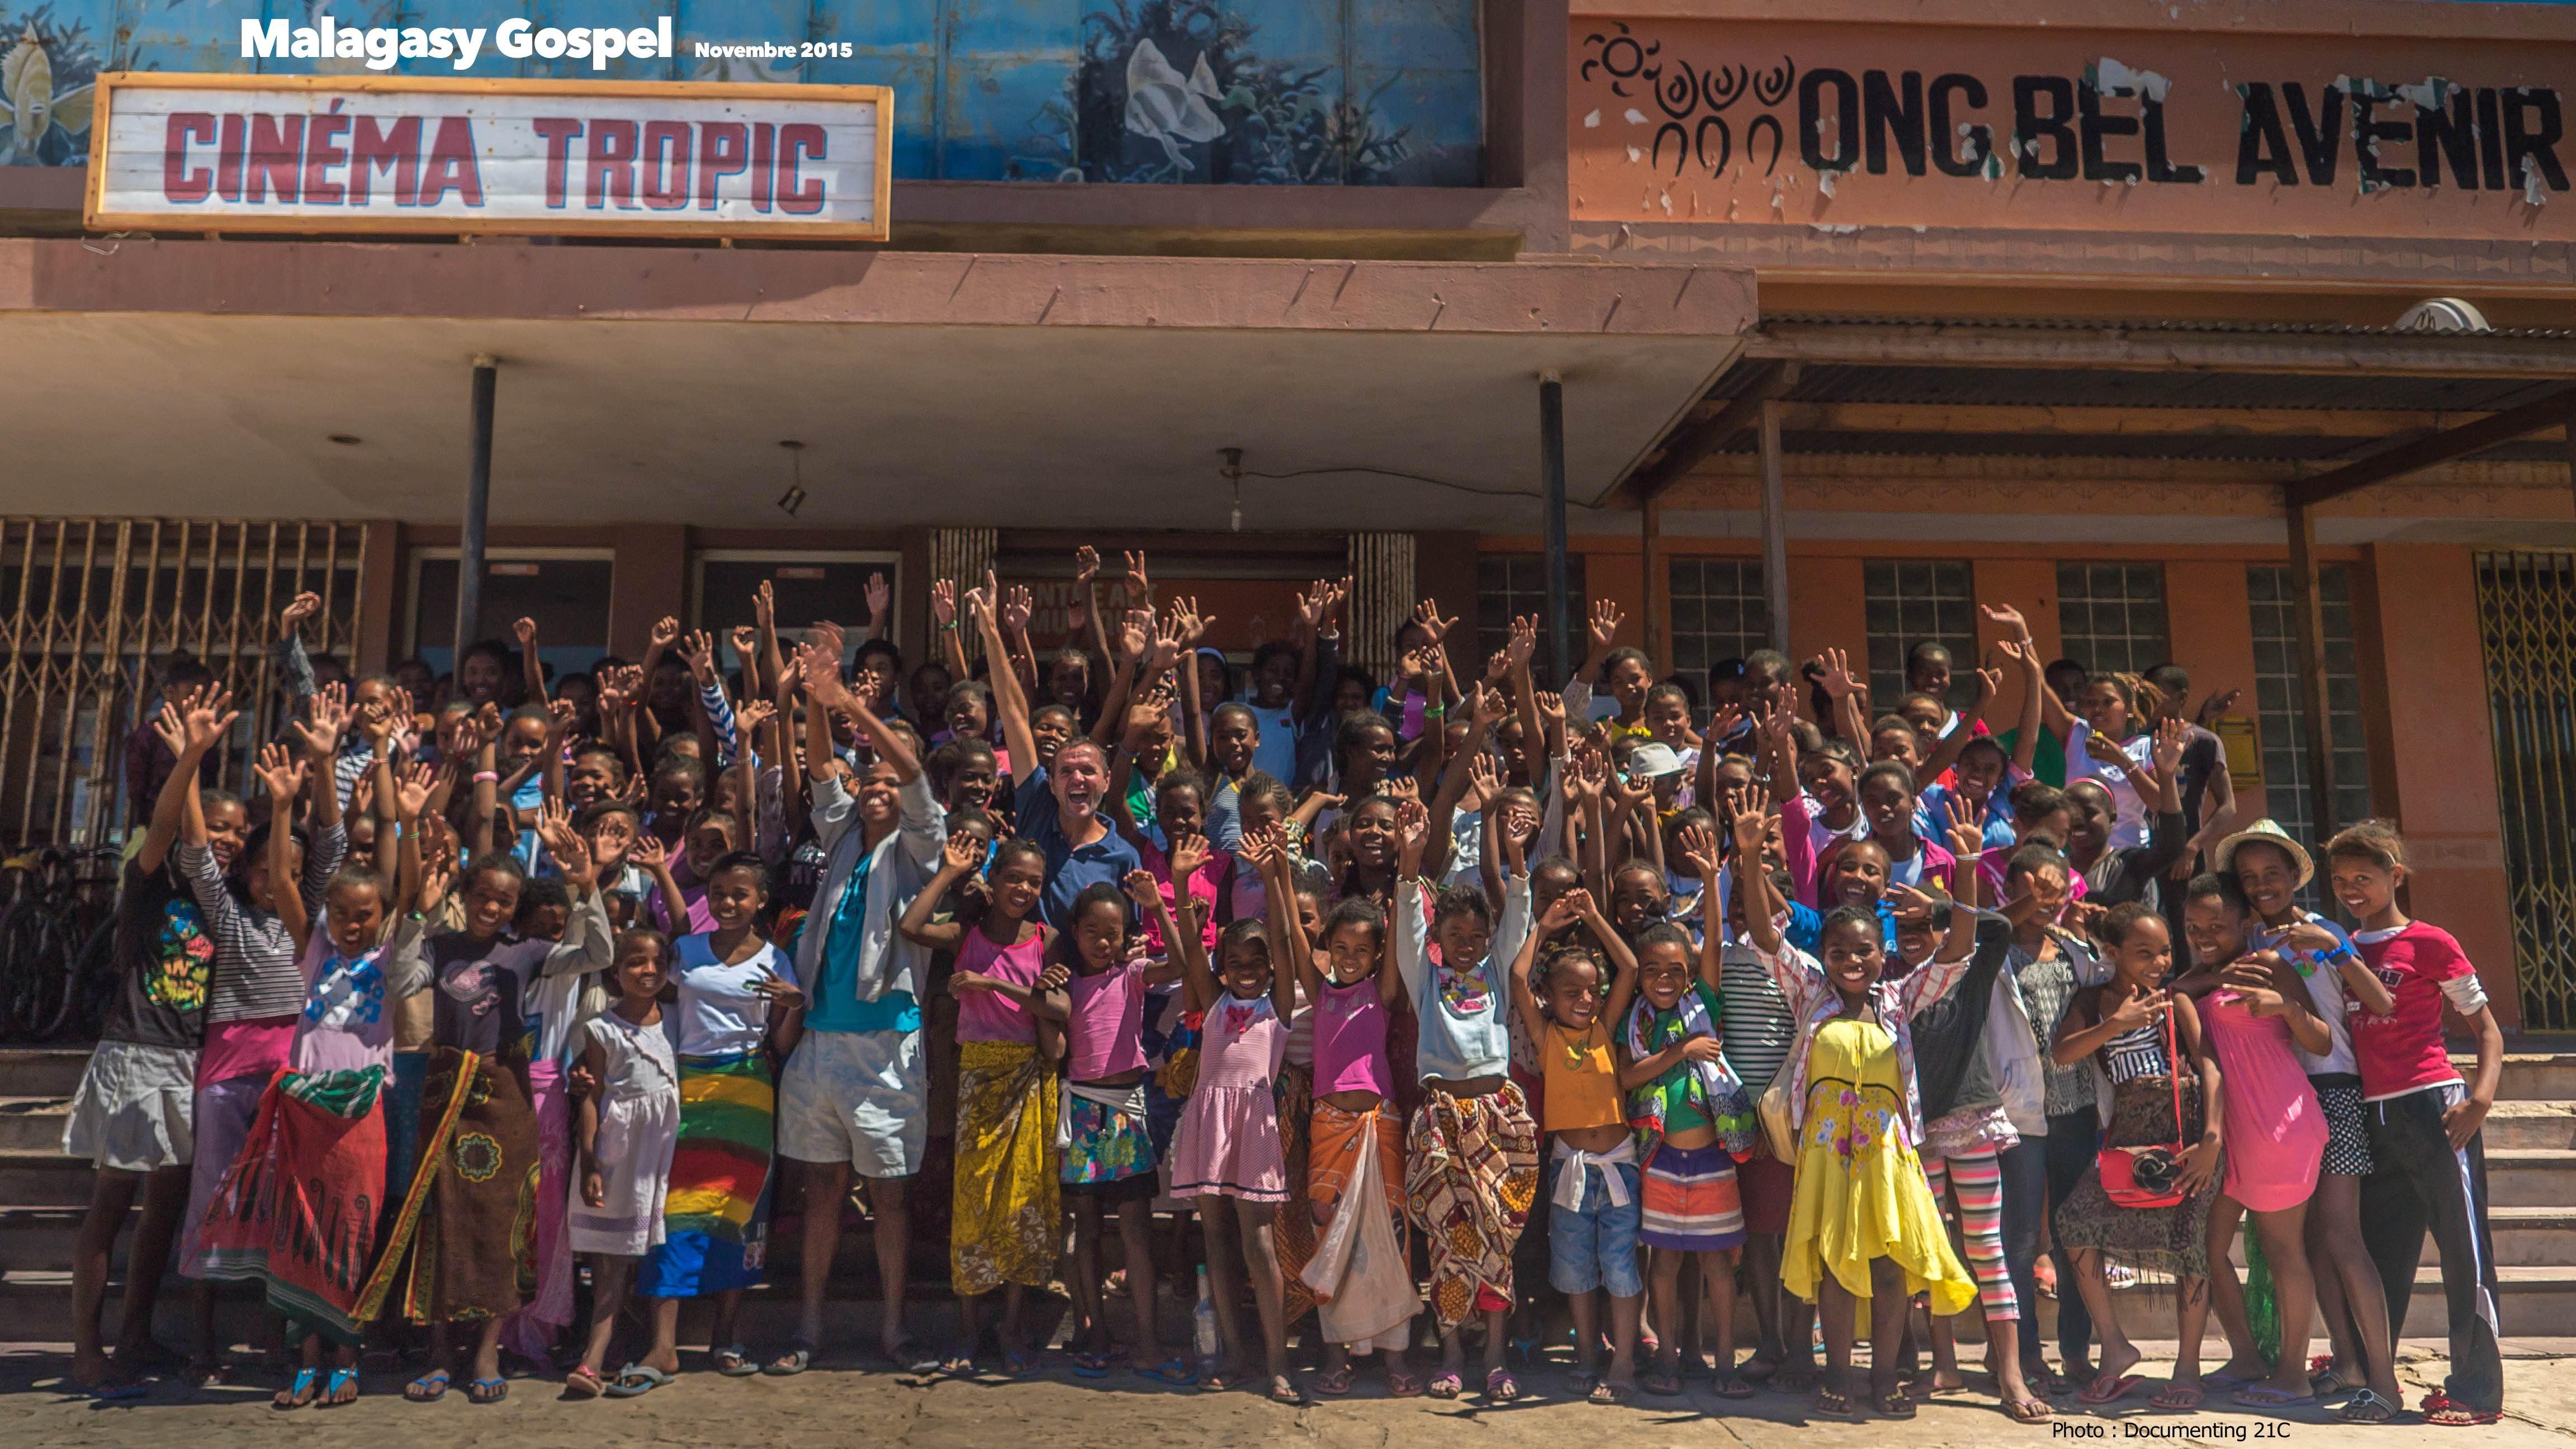 Malagasy Gospel novembre 2015